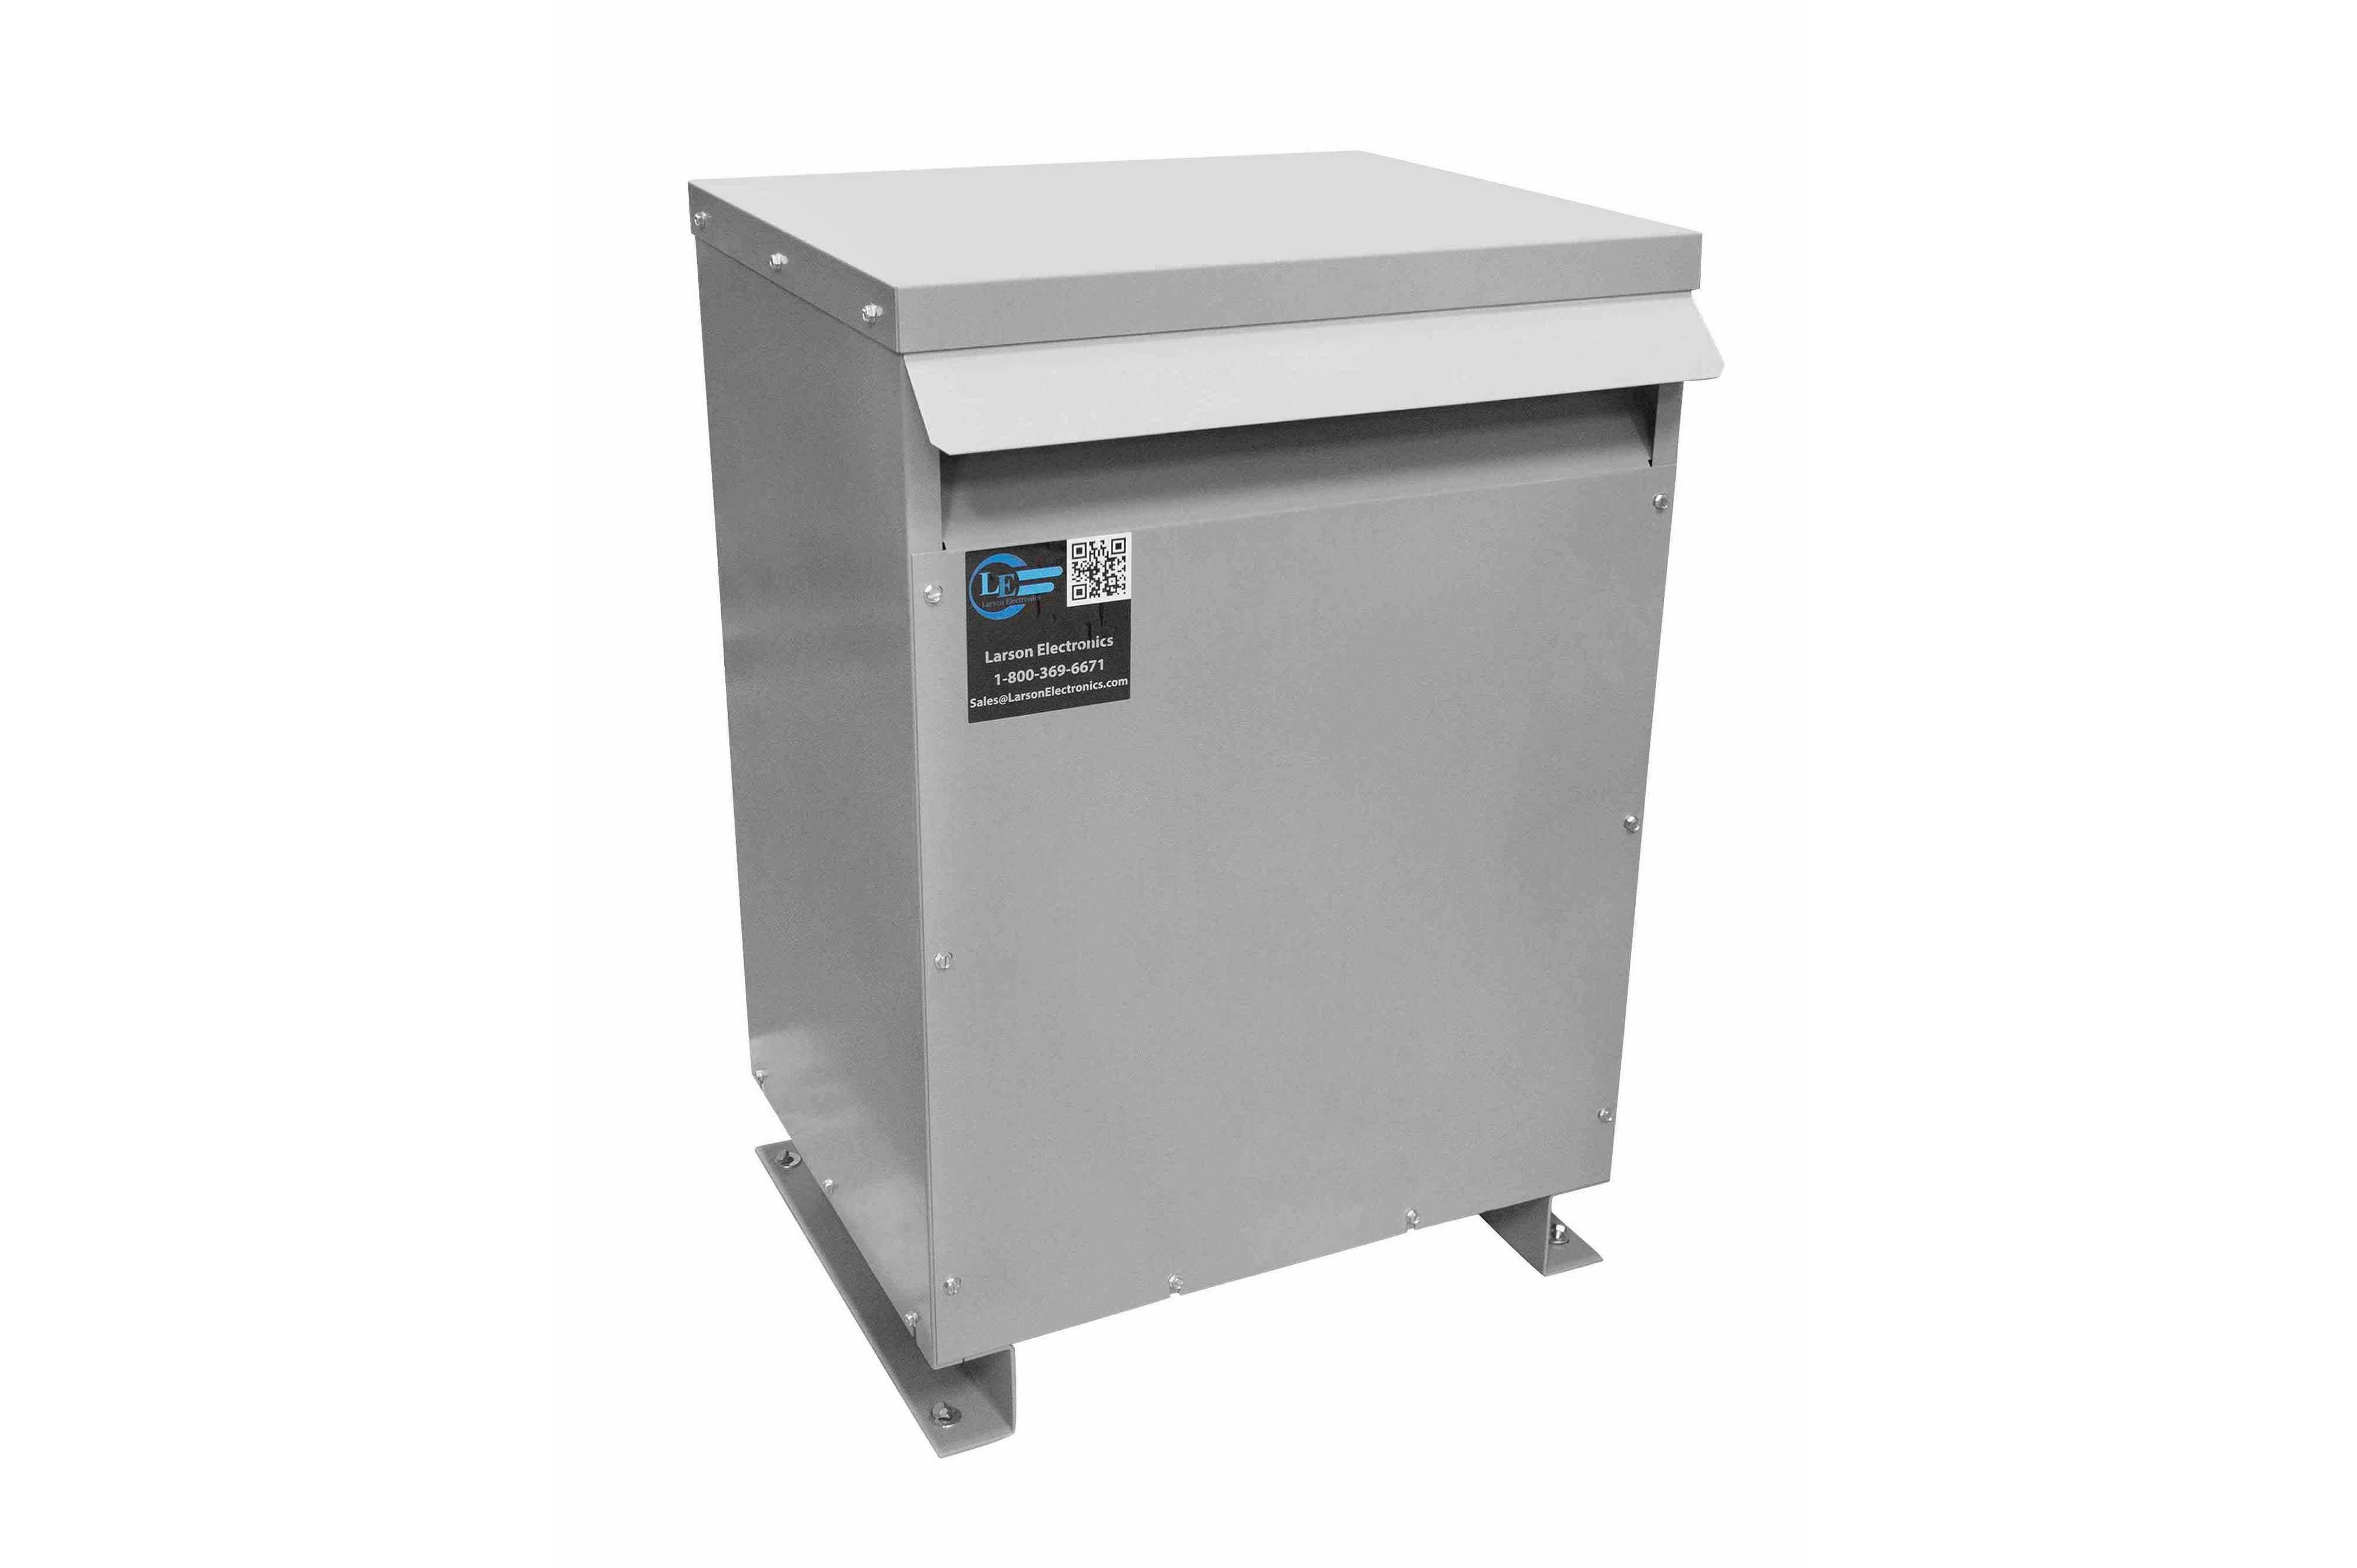 27 kVA 3PH Isolation Transformer, 380V Wye Primary, 240V/120 Delta Secondary, N3R, Ventilated, 60 Hz